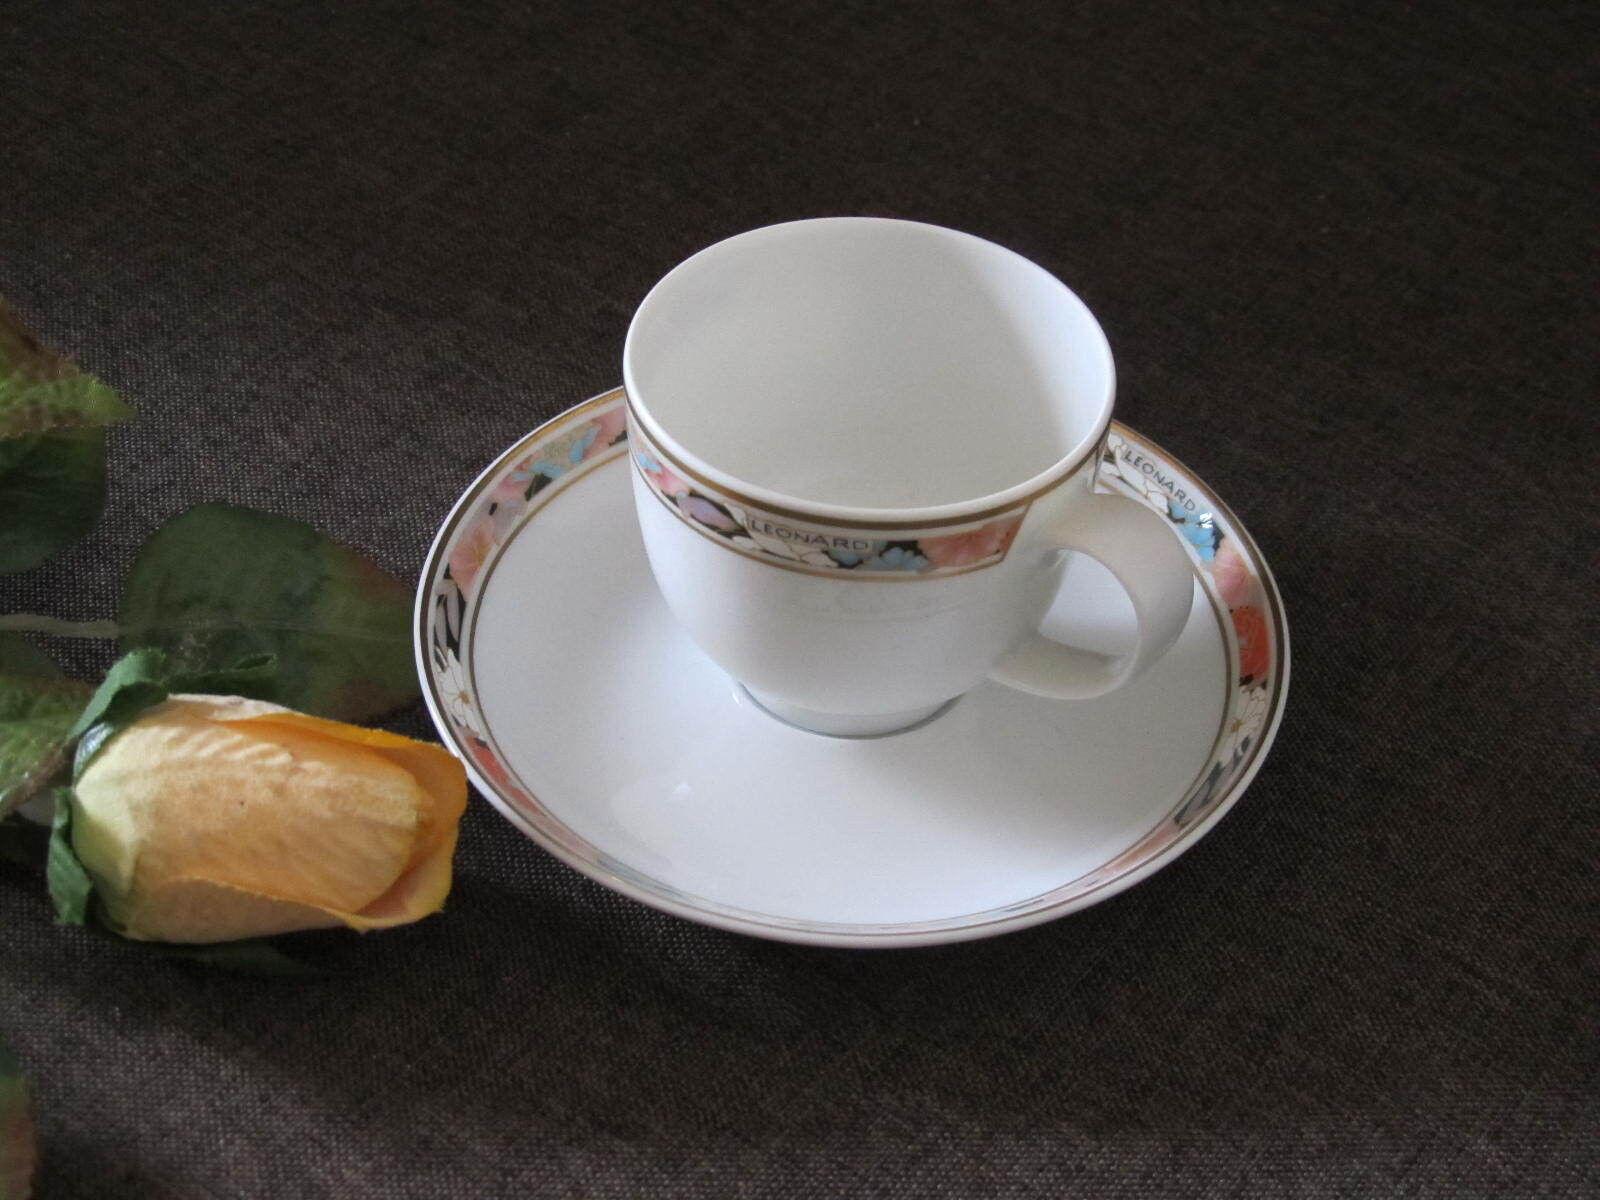 Galleria Bologne 6 Espresso Tasses 2 pièces Hutschenreuther